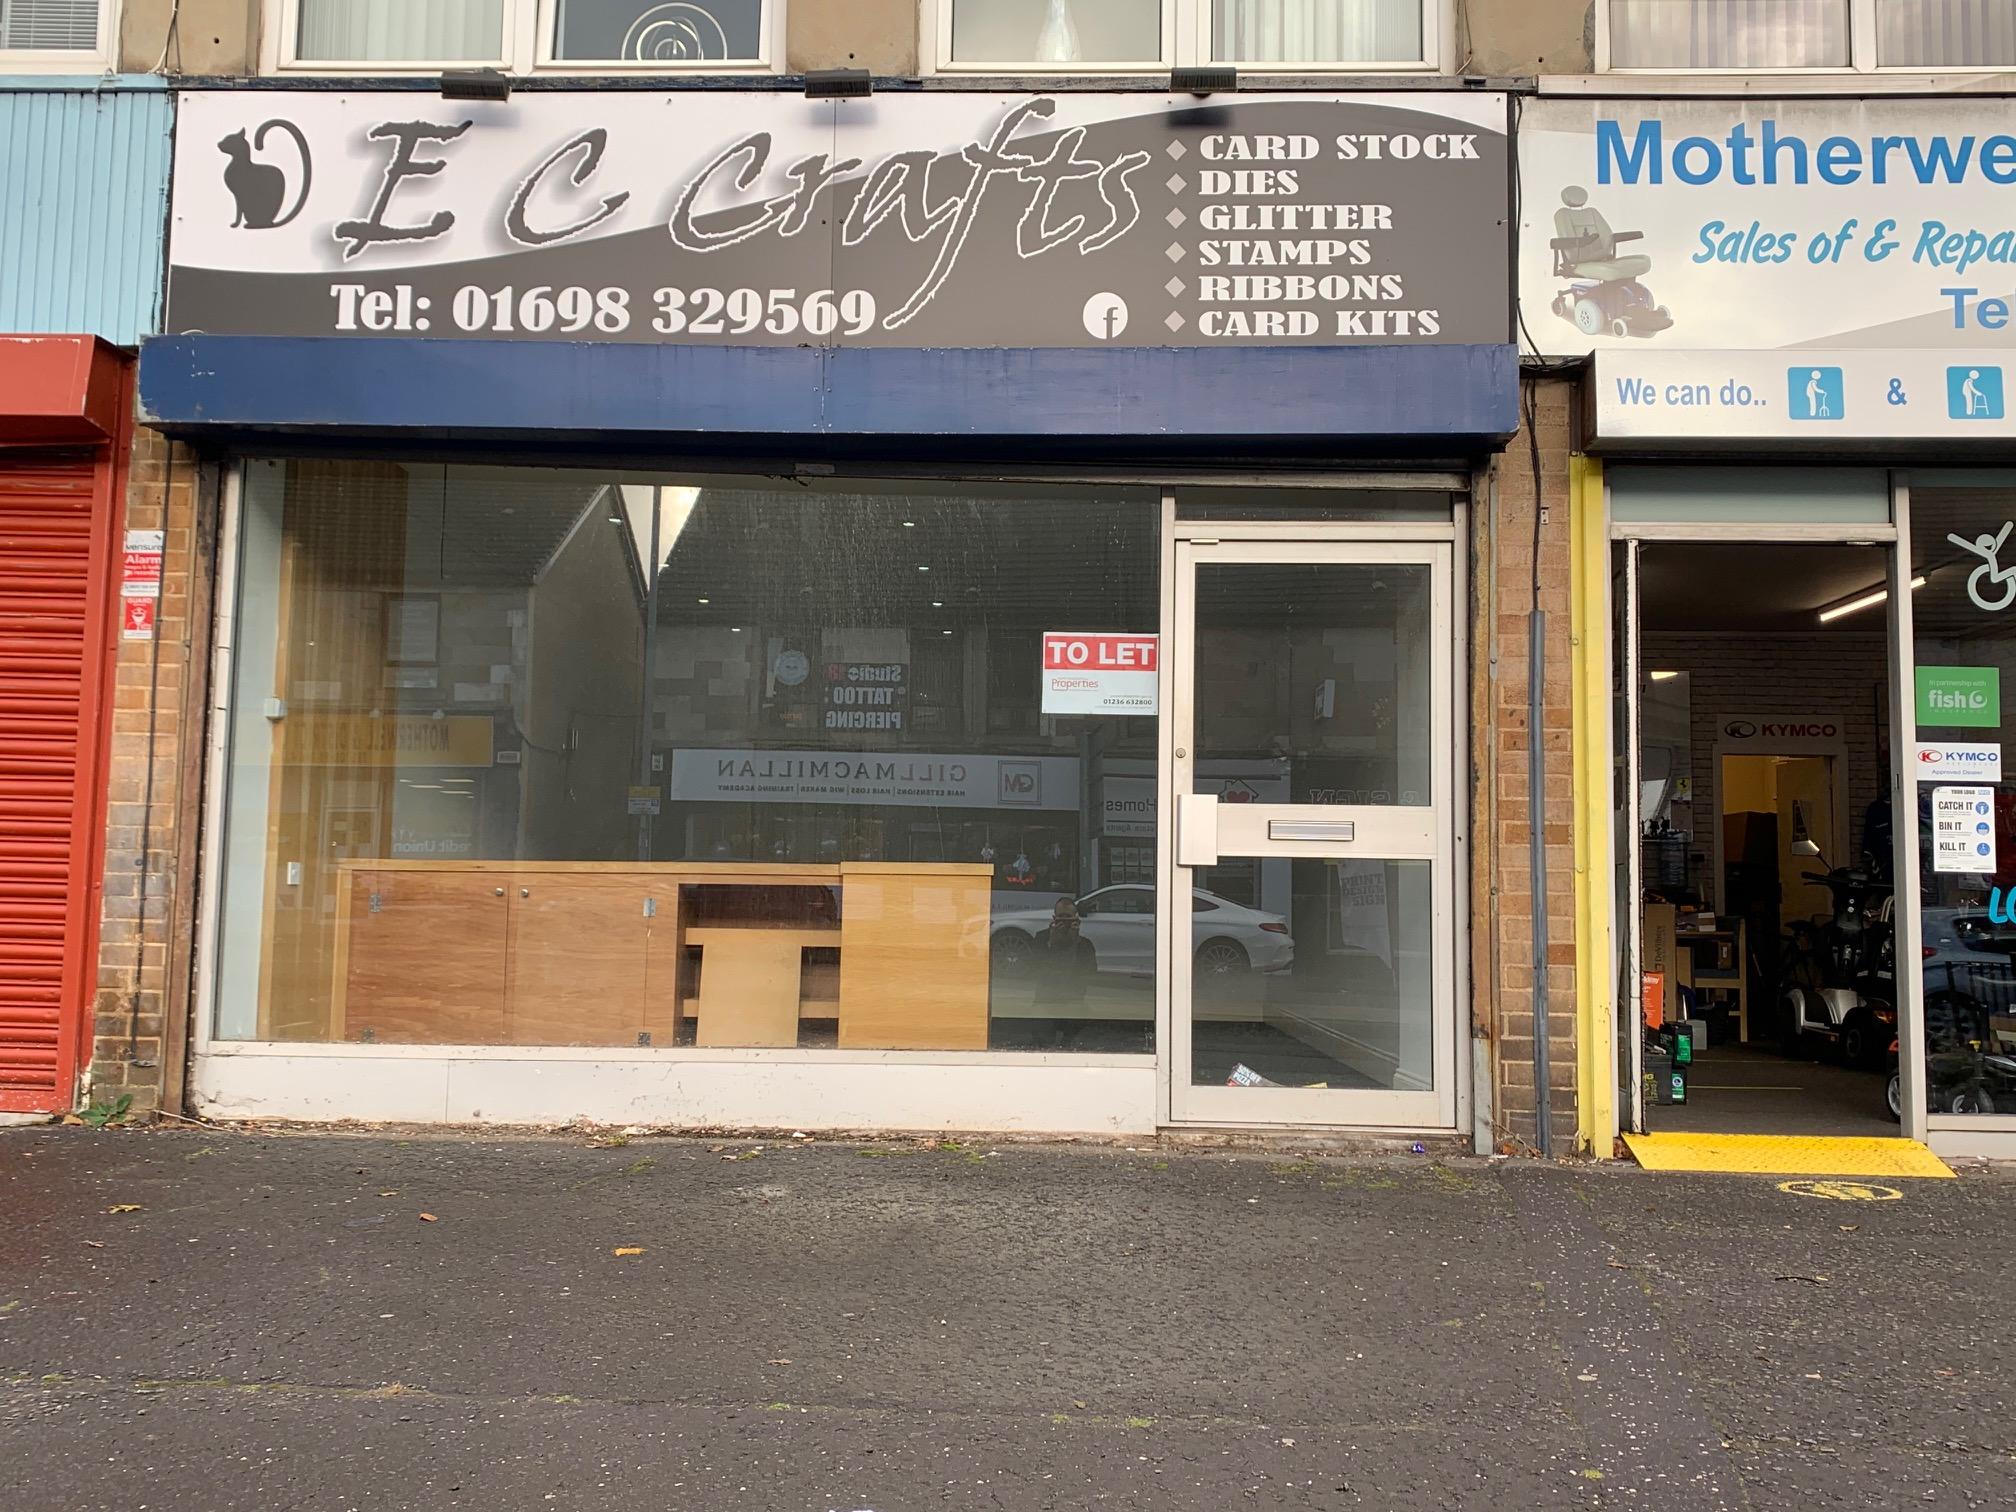 143 Merry Street, Motherwell